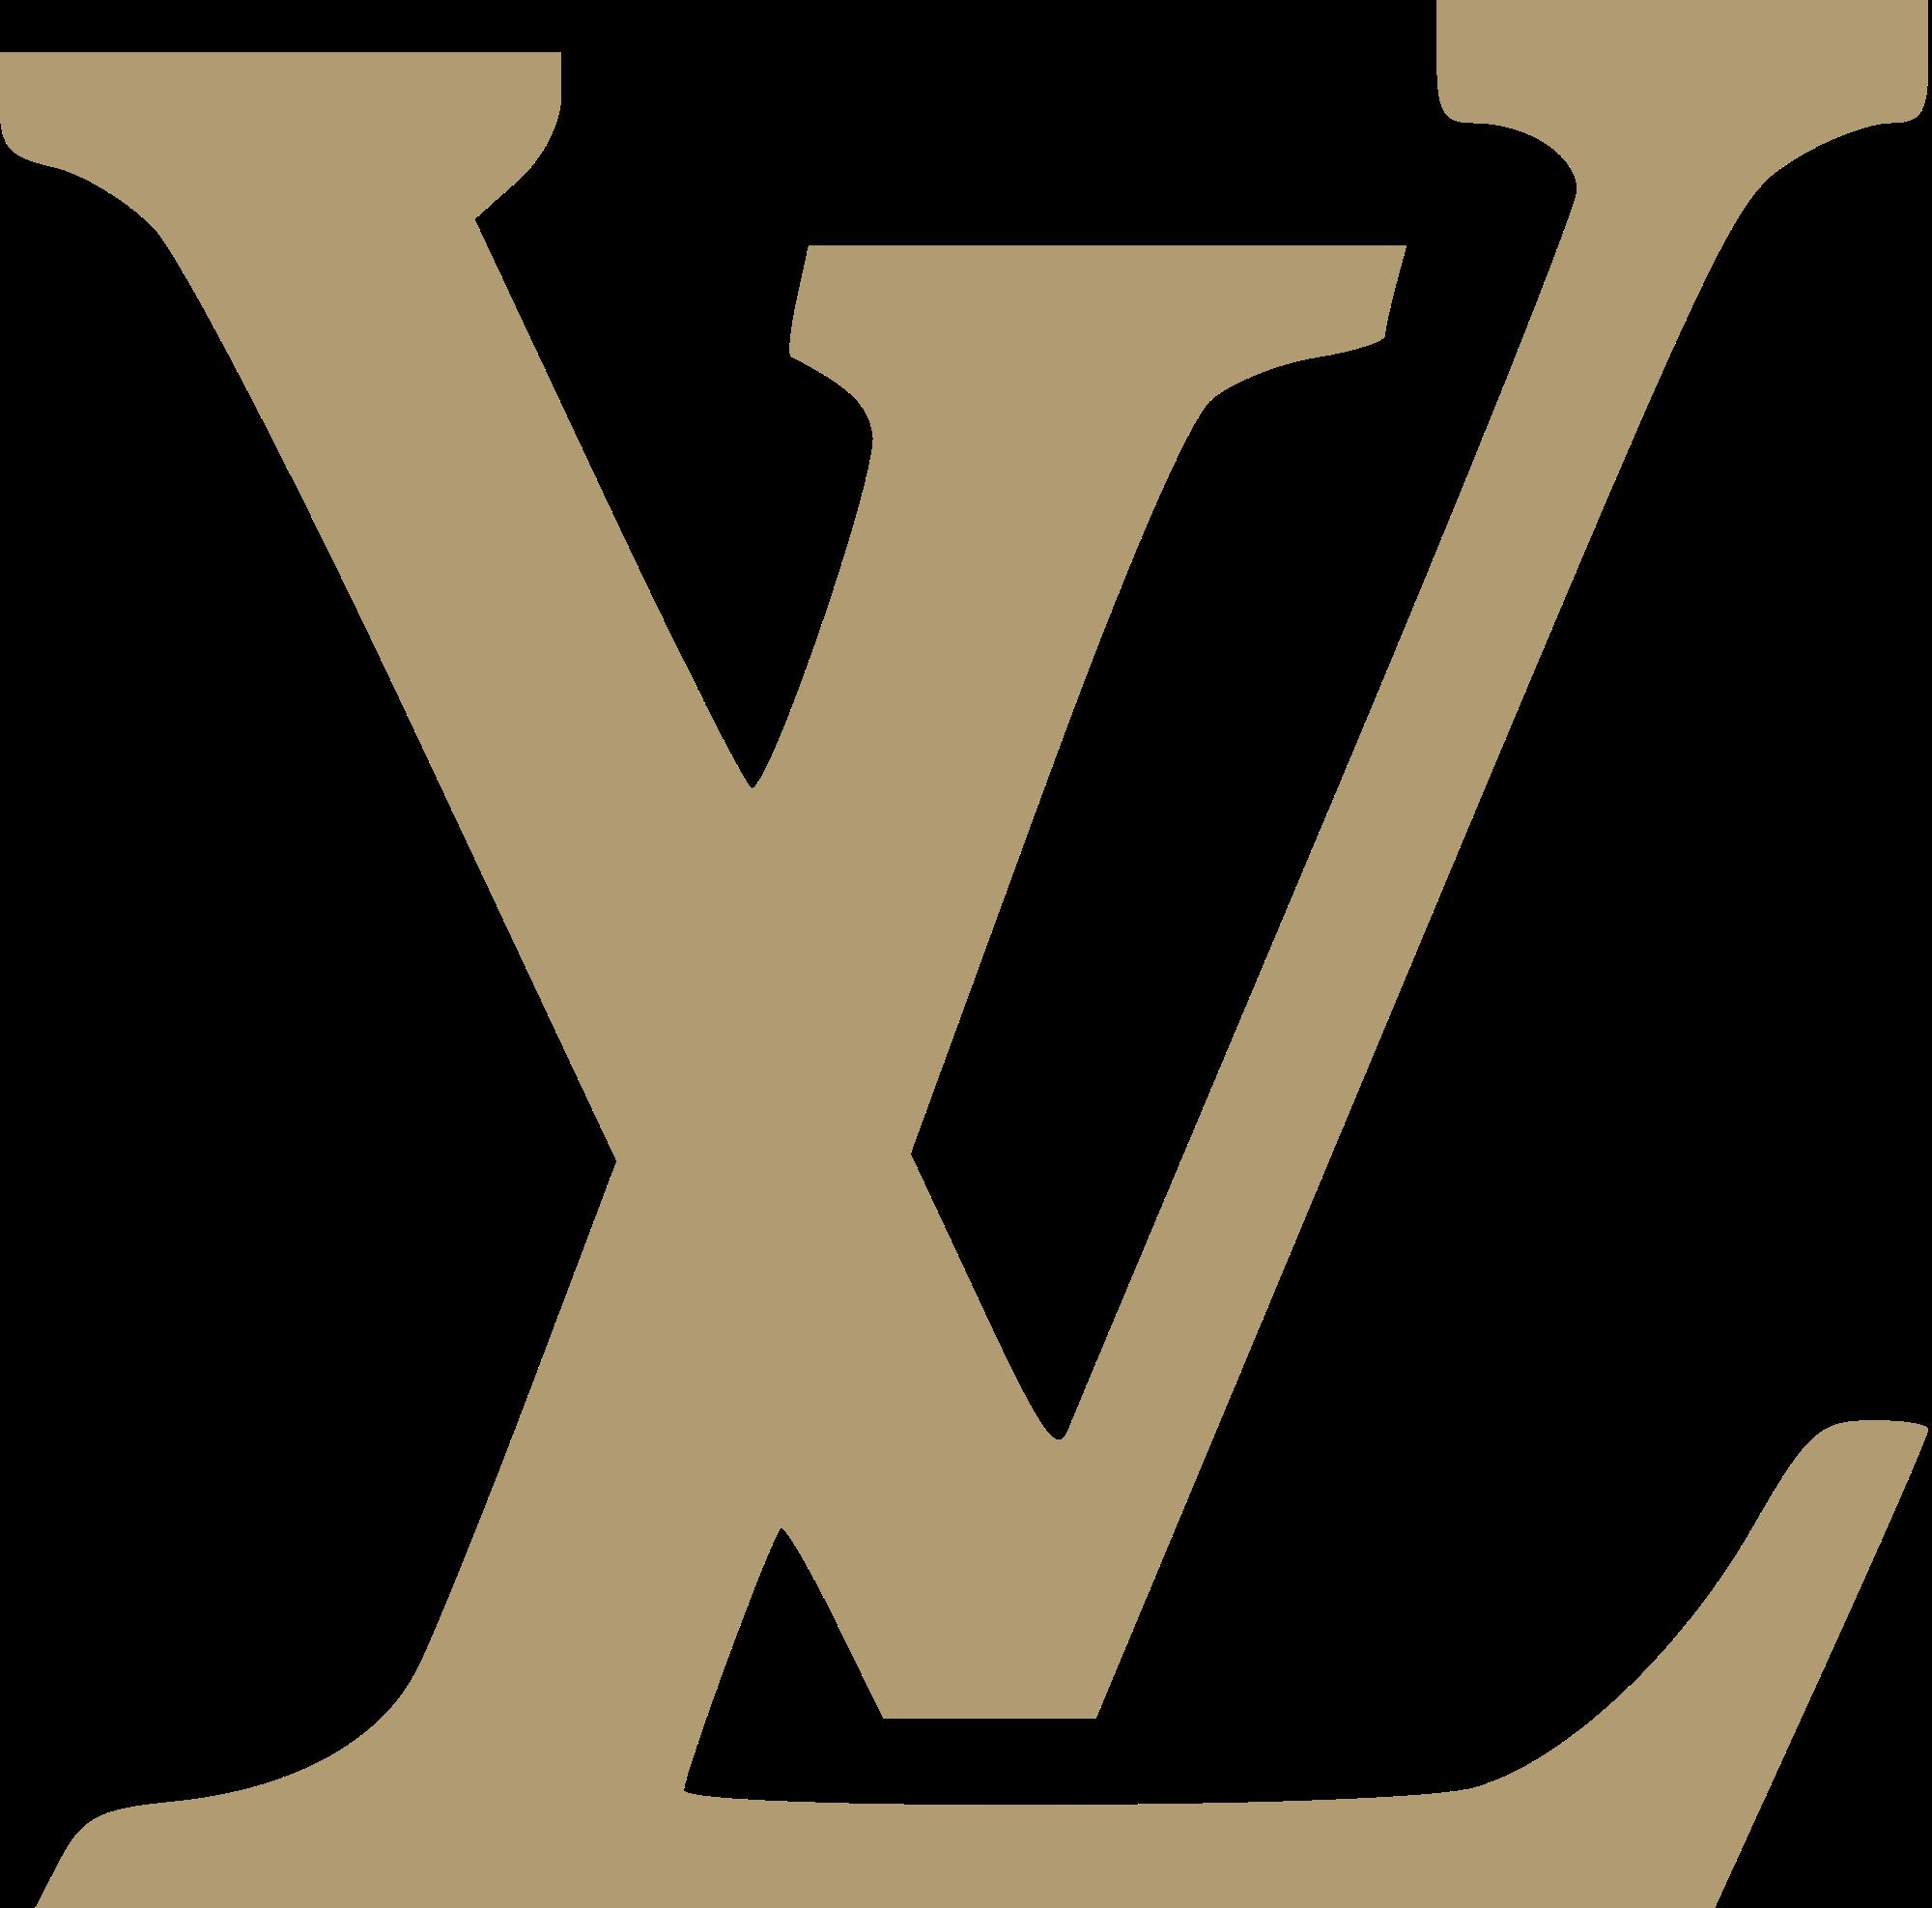 vector free library yeti svg screensaver #109312305